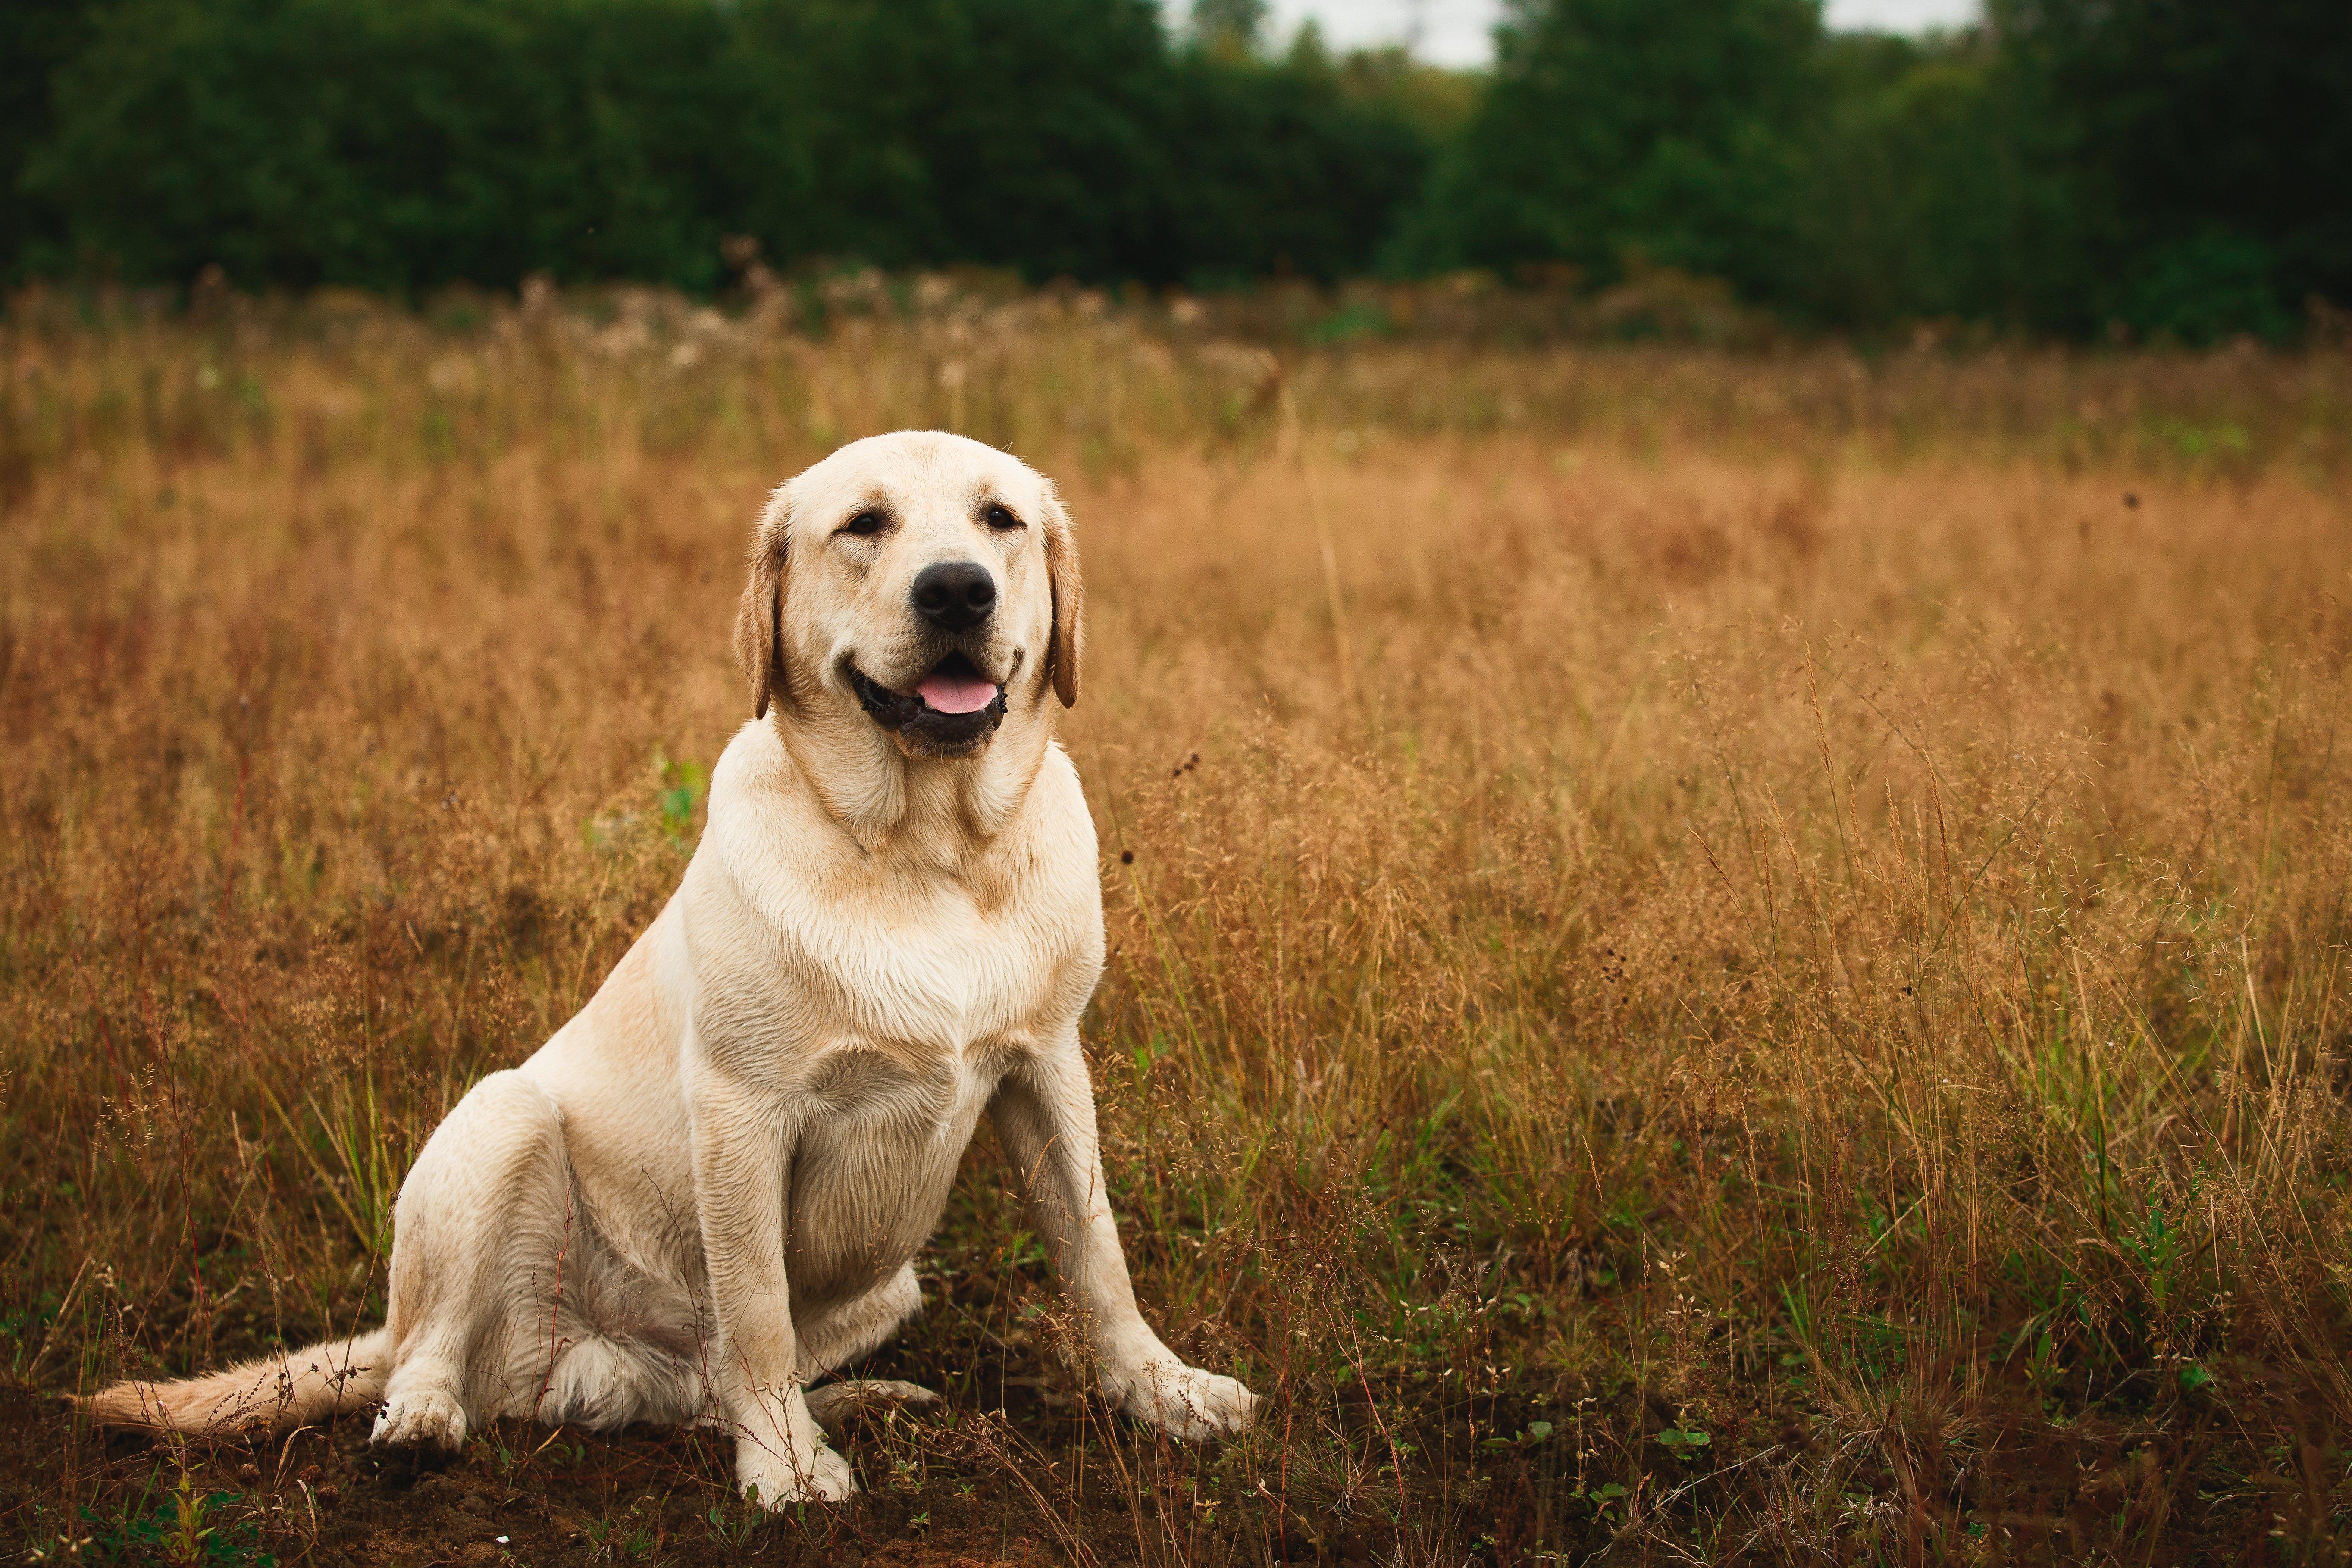 bigstock-Dog-Sitting-In-Tranquil-Field-210873283